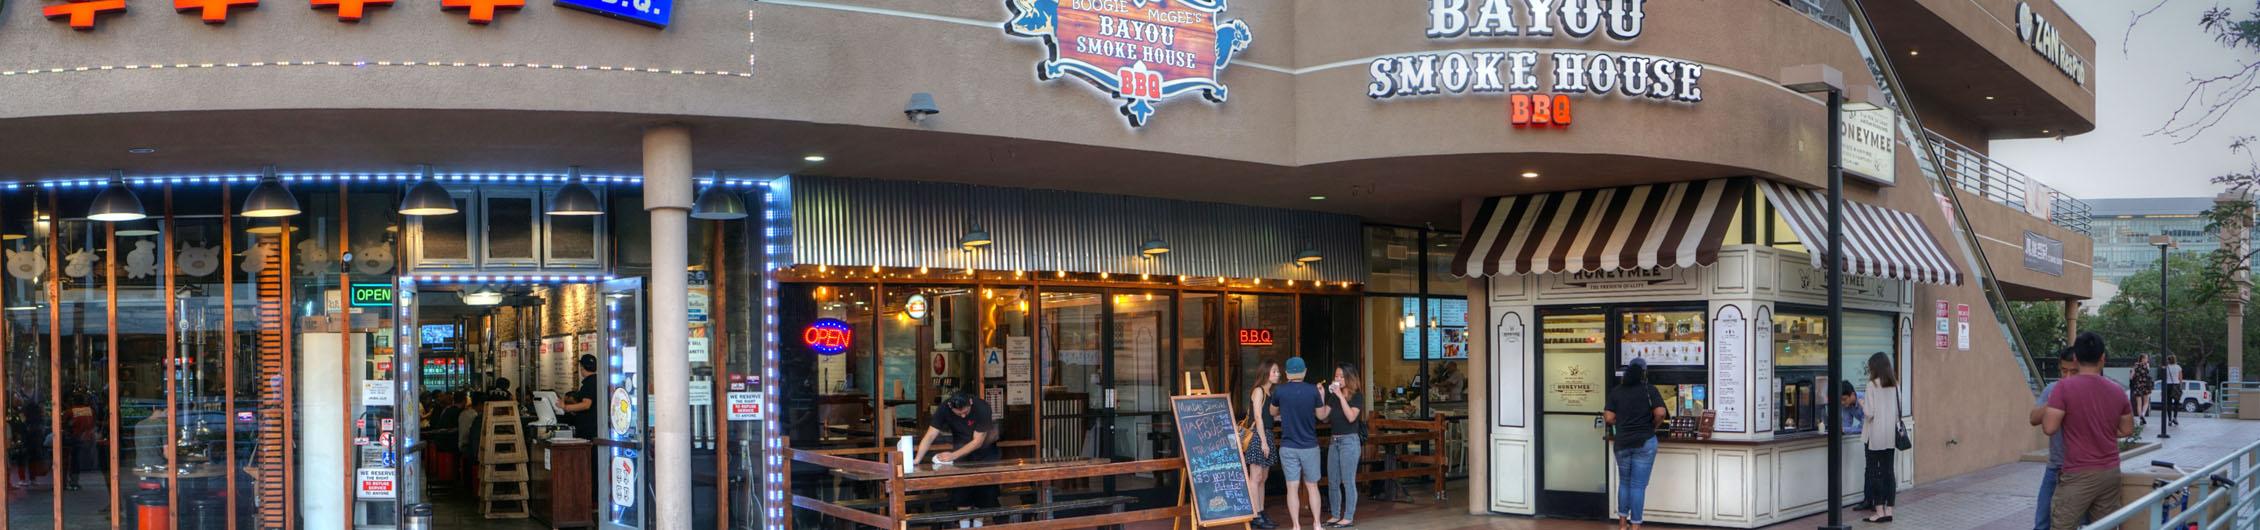 Boogie McGee's Bayou Smokehouse BBQ Exterior